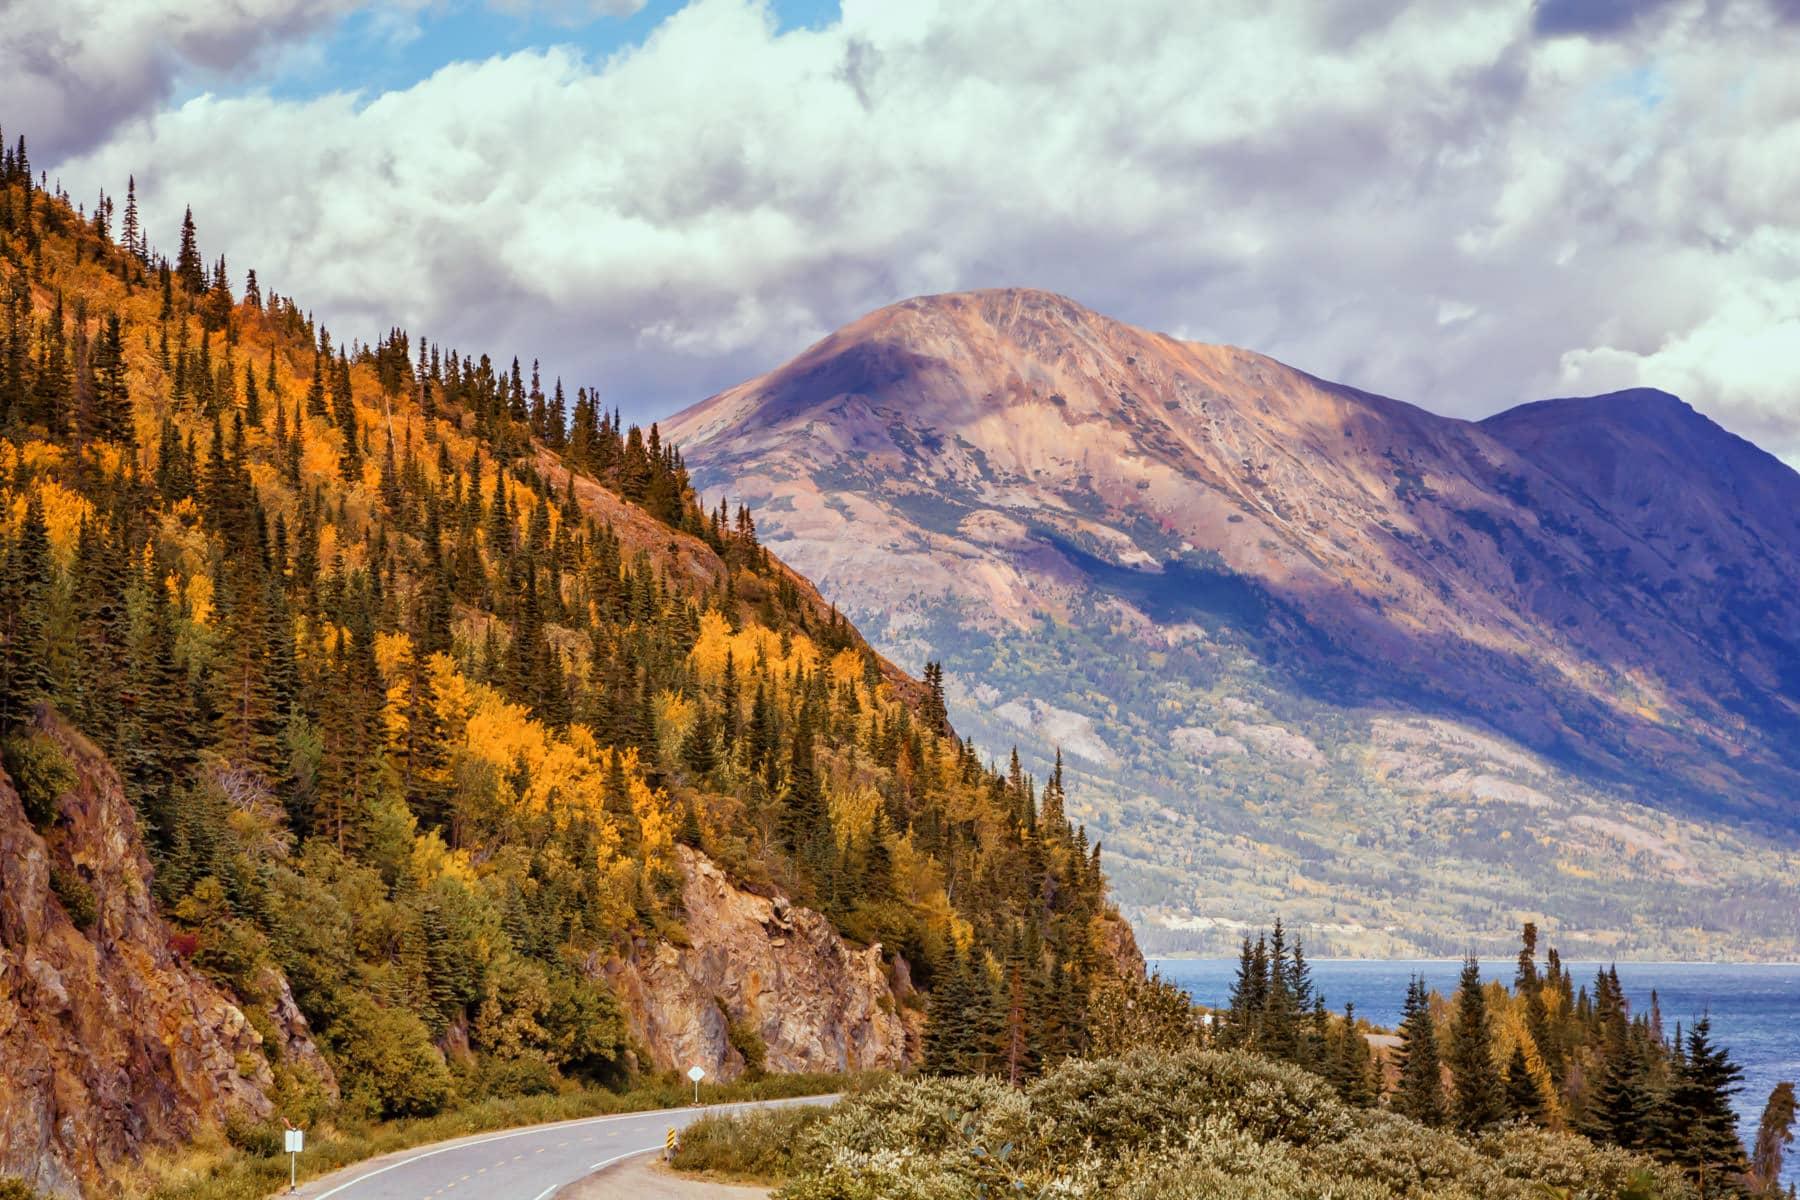 The Klondike Highway creeps around mountains along the shore of Tutshi Lake in British Columbia's Stikine Region.